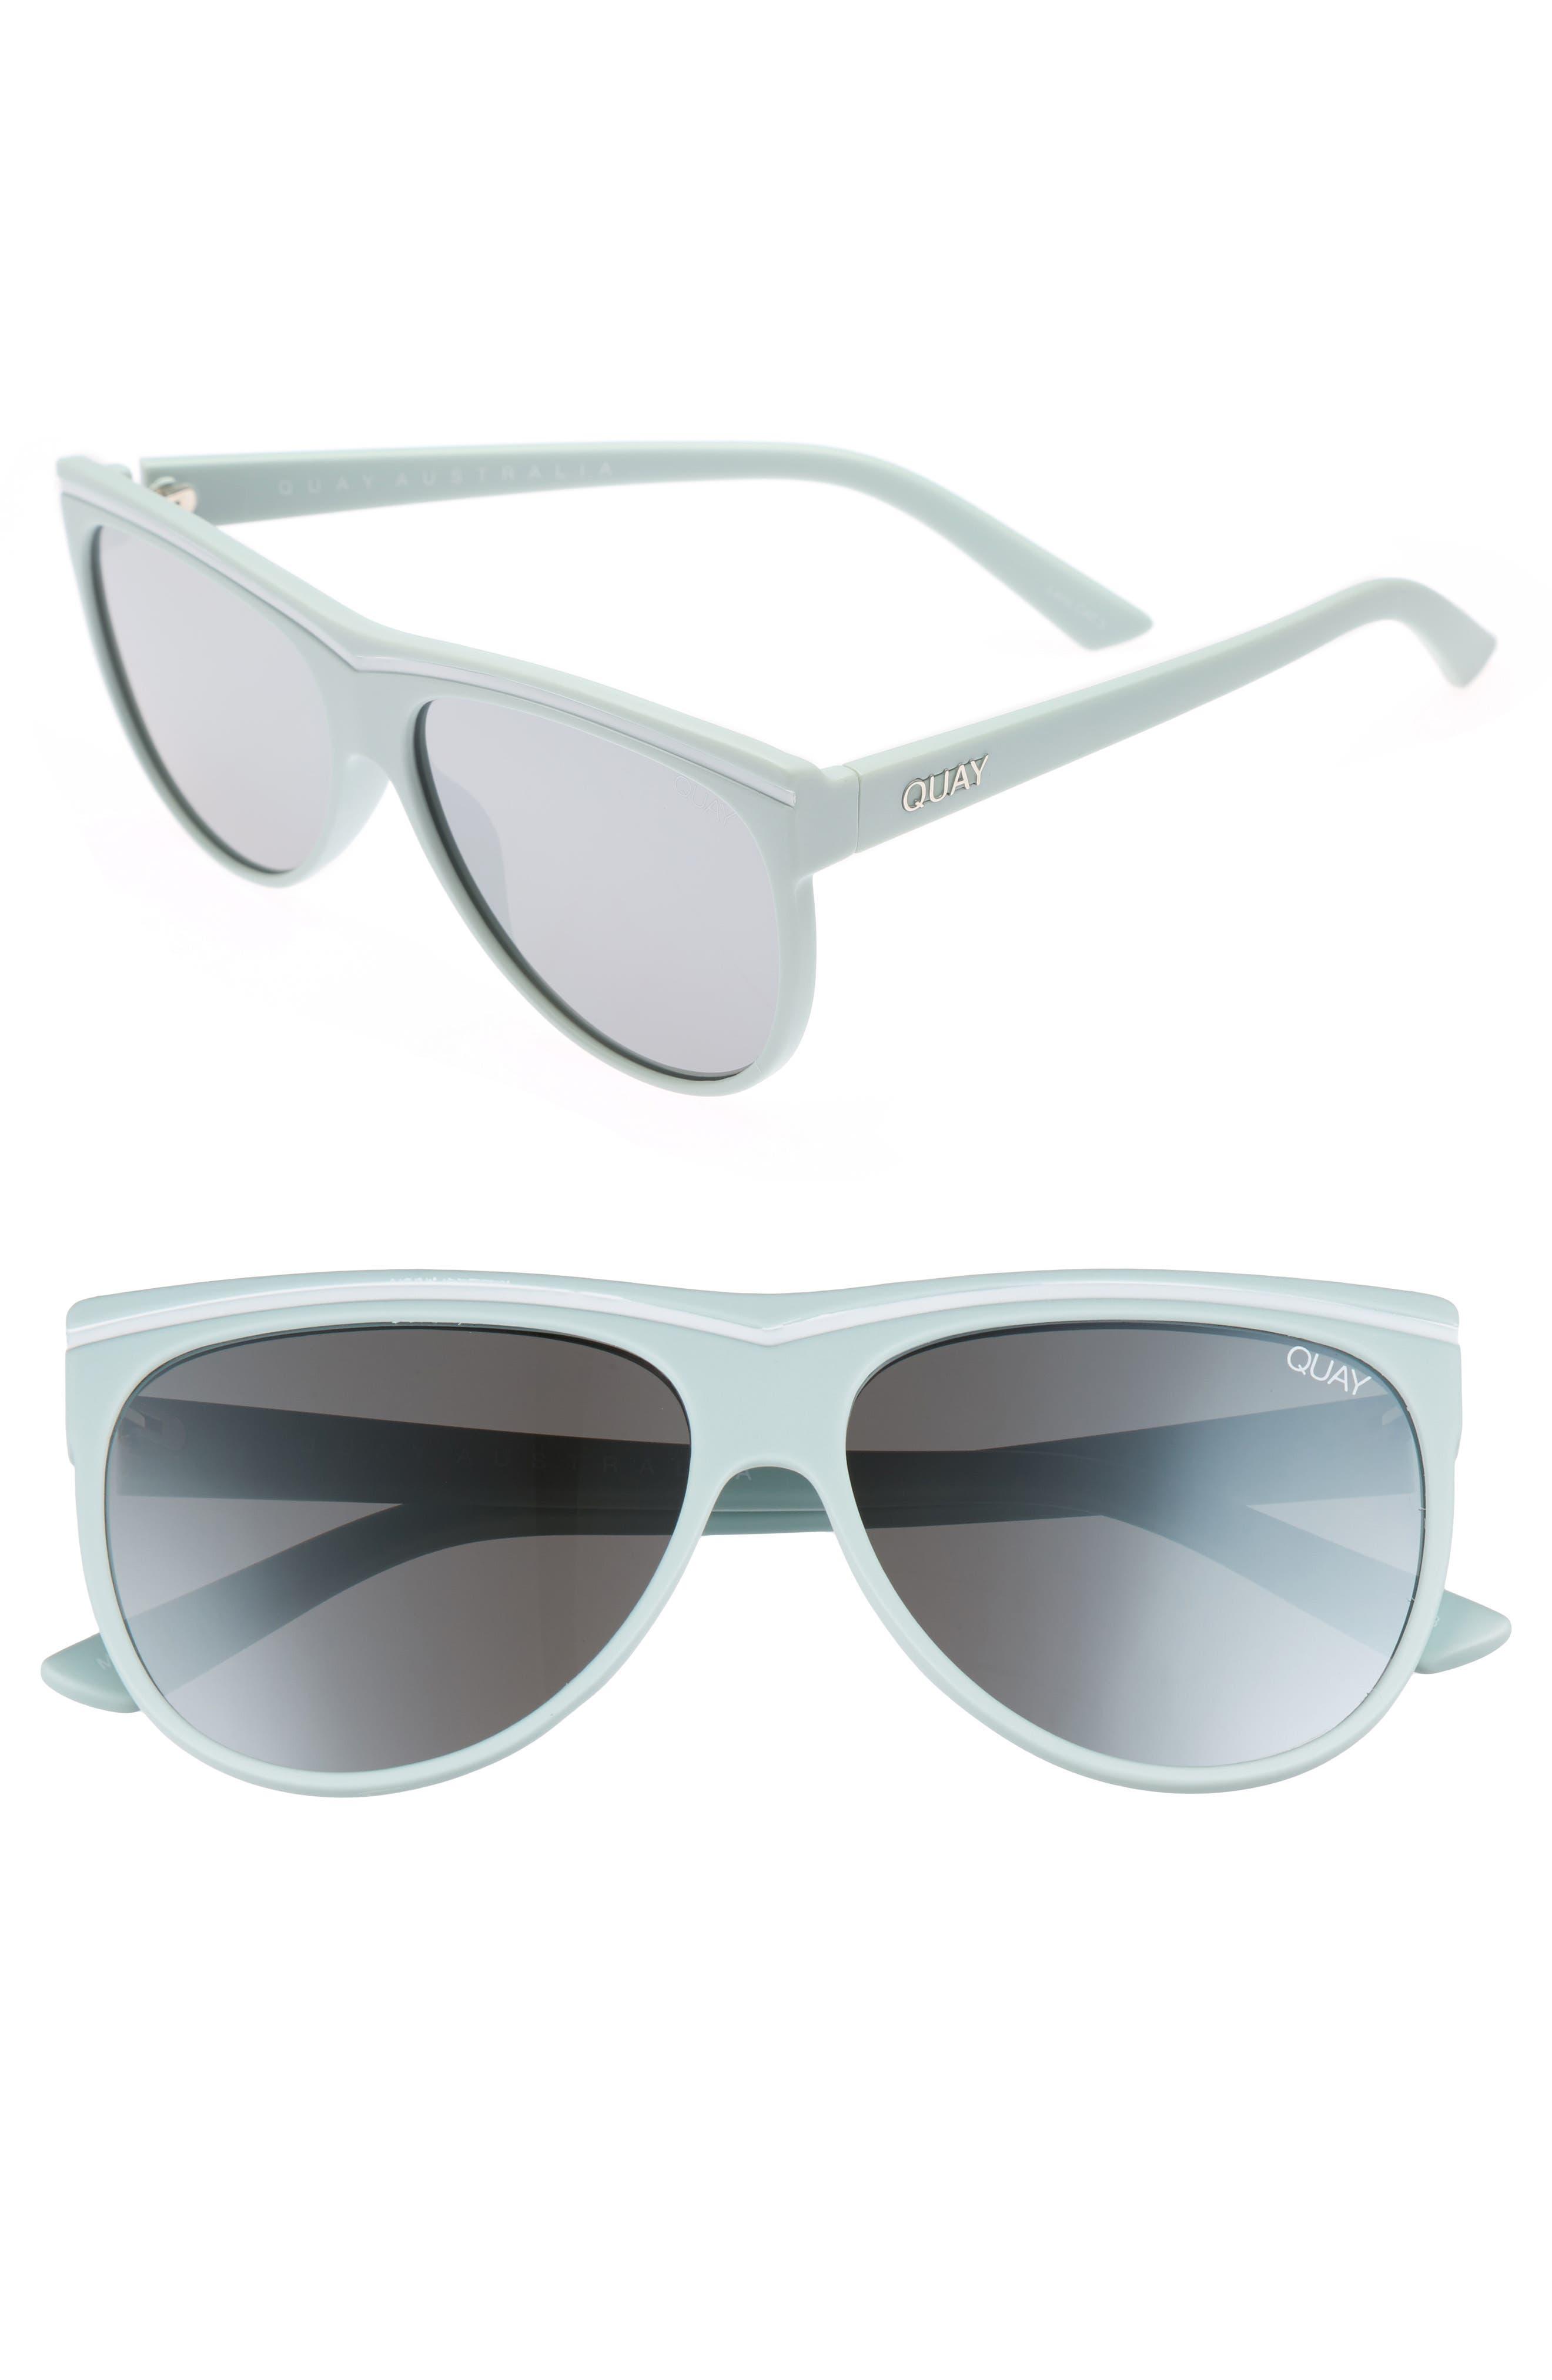 Quay Australia Hollywood Nights 62mm Sunglasses